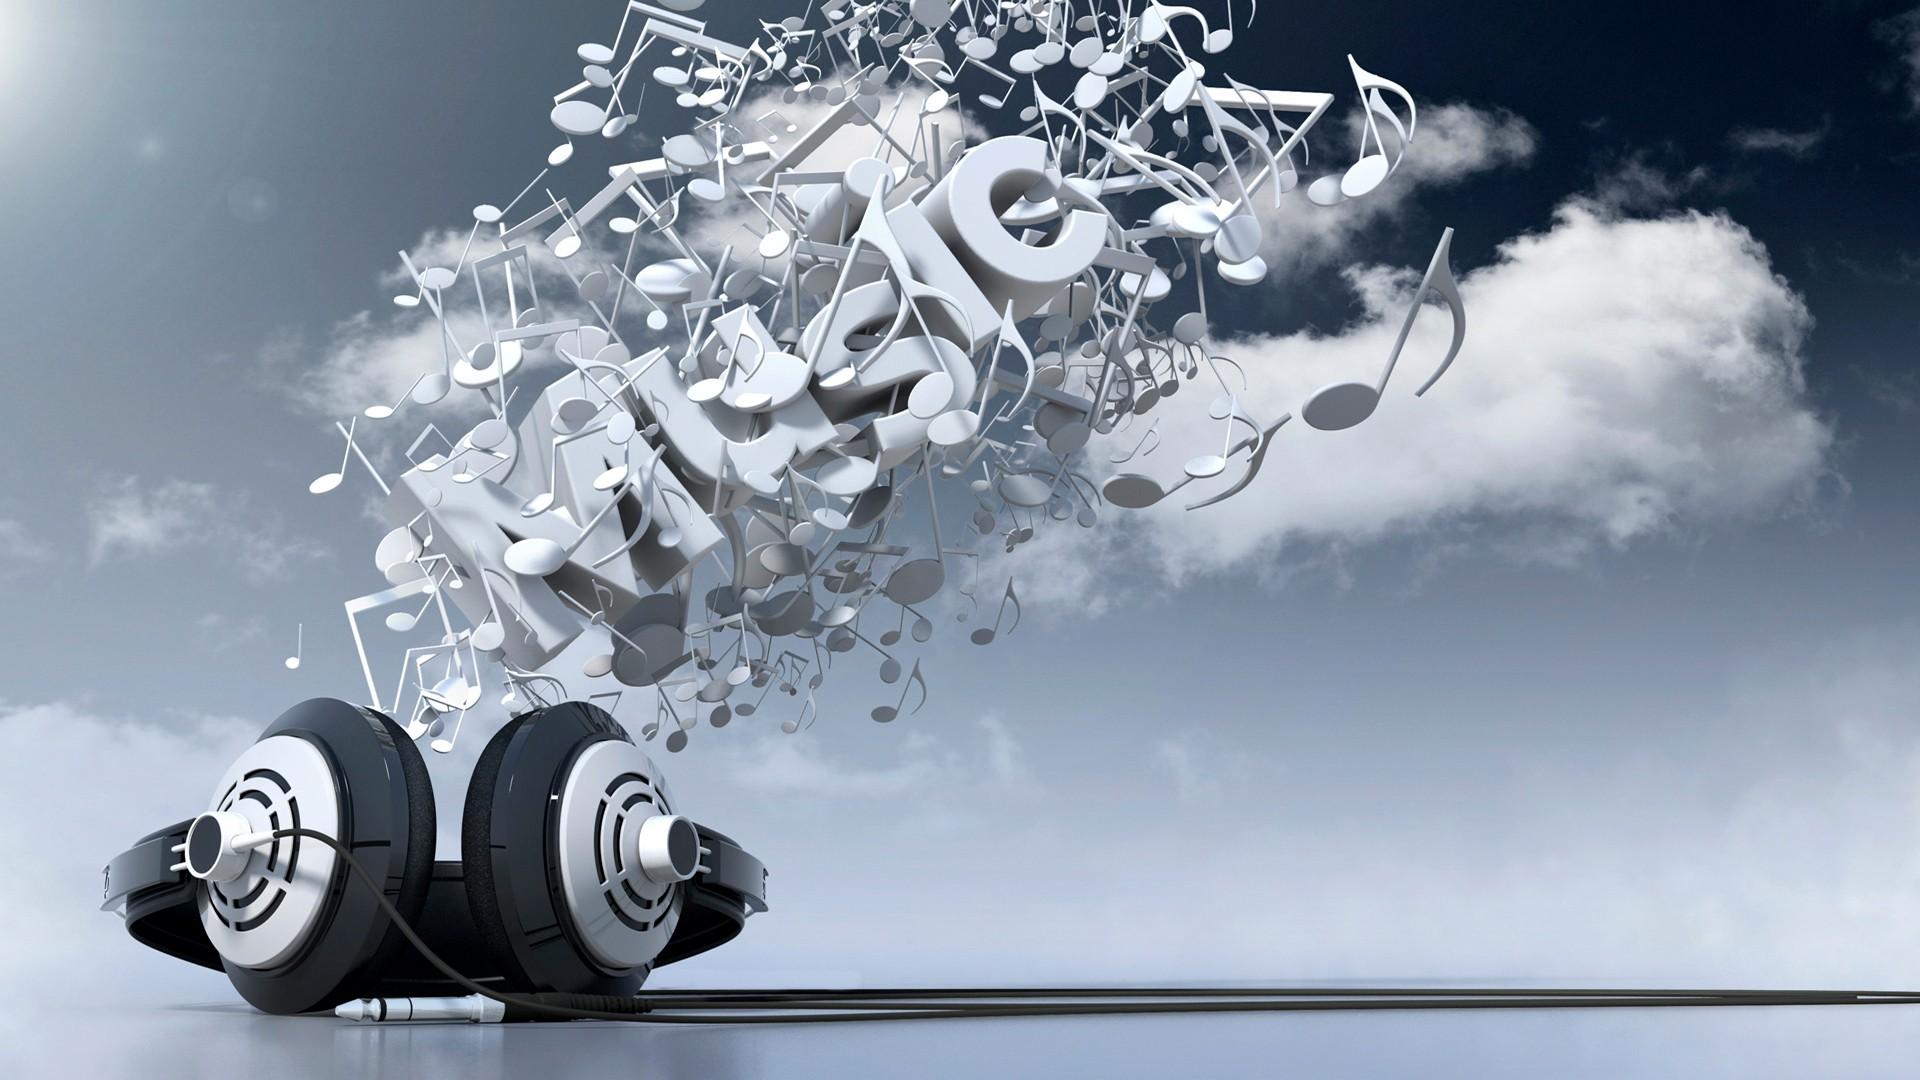 Music wallpaper HD ·① Download free stunning wallpapers ...  Mobile Music Hd Wallpaper